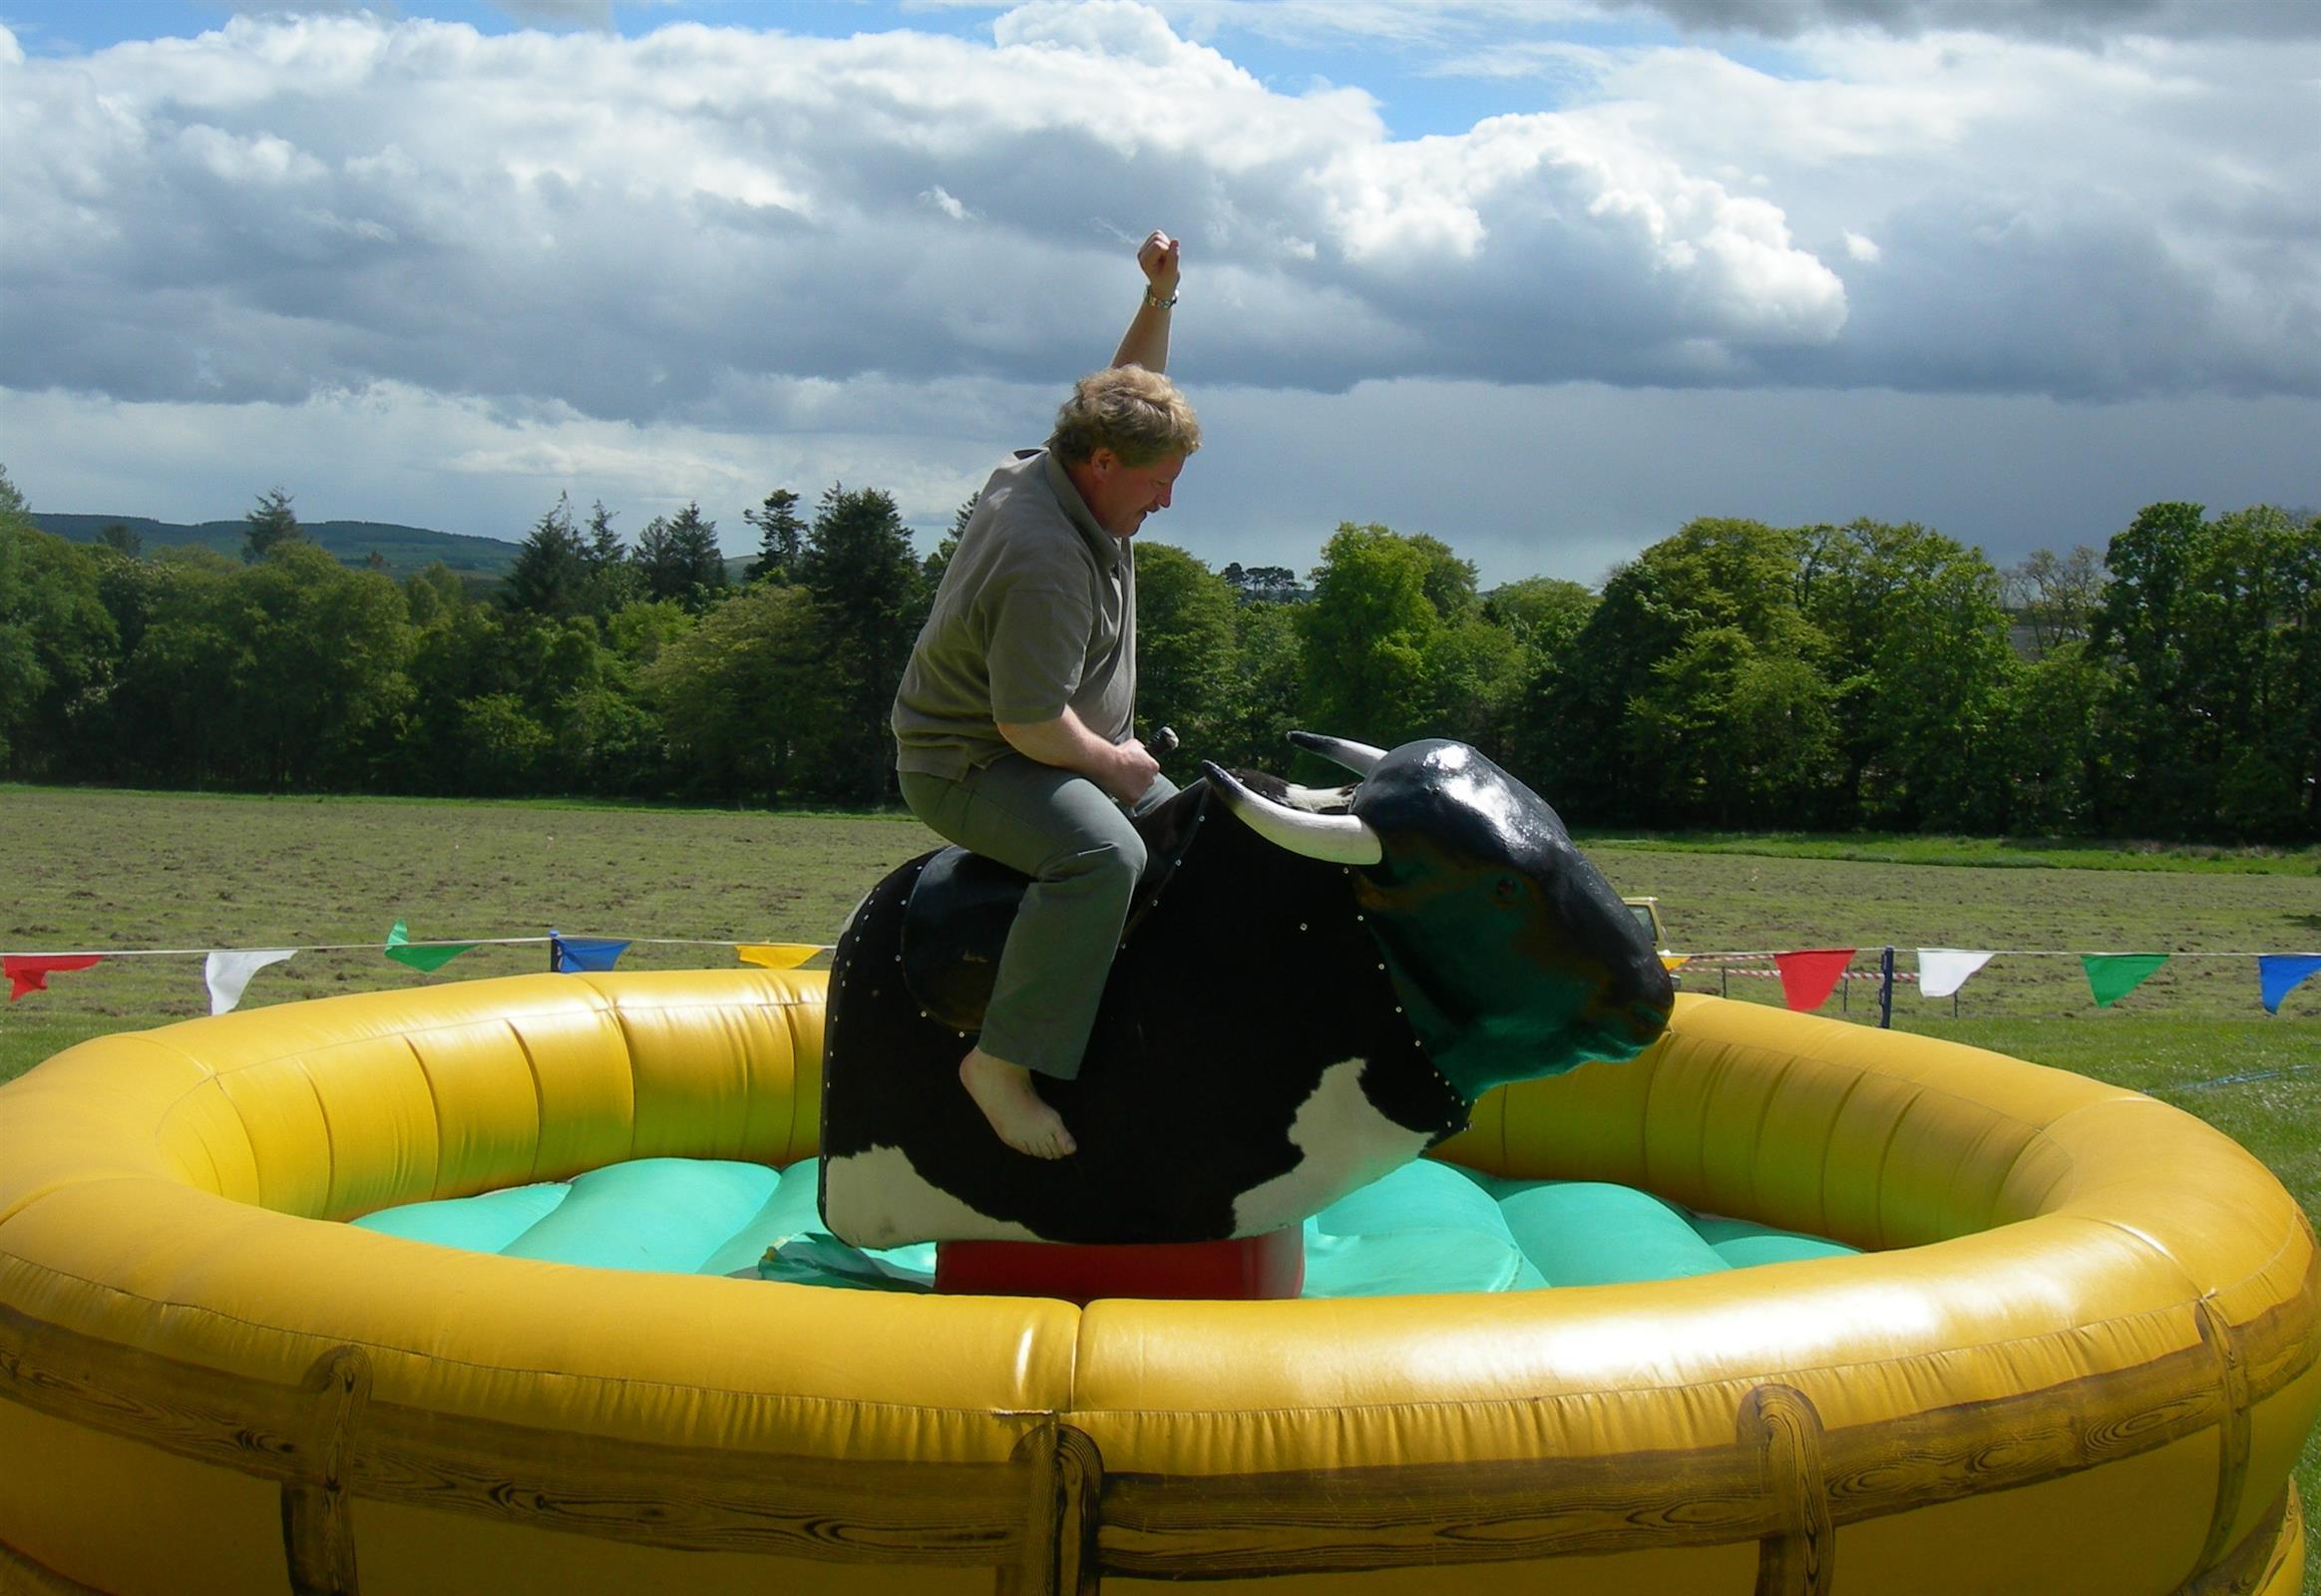 Bucking Bronco Hire In Fife Edinburgh And Glasgow